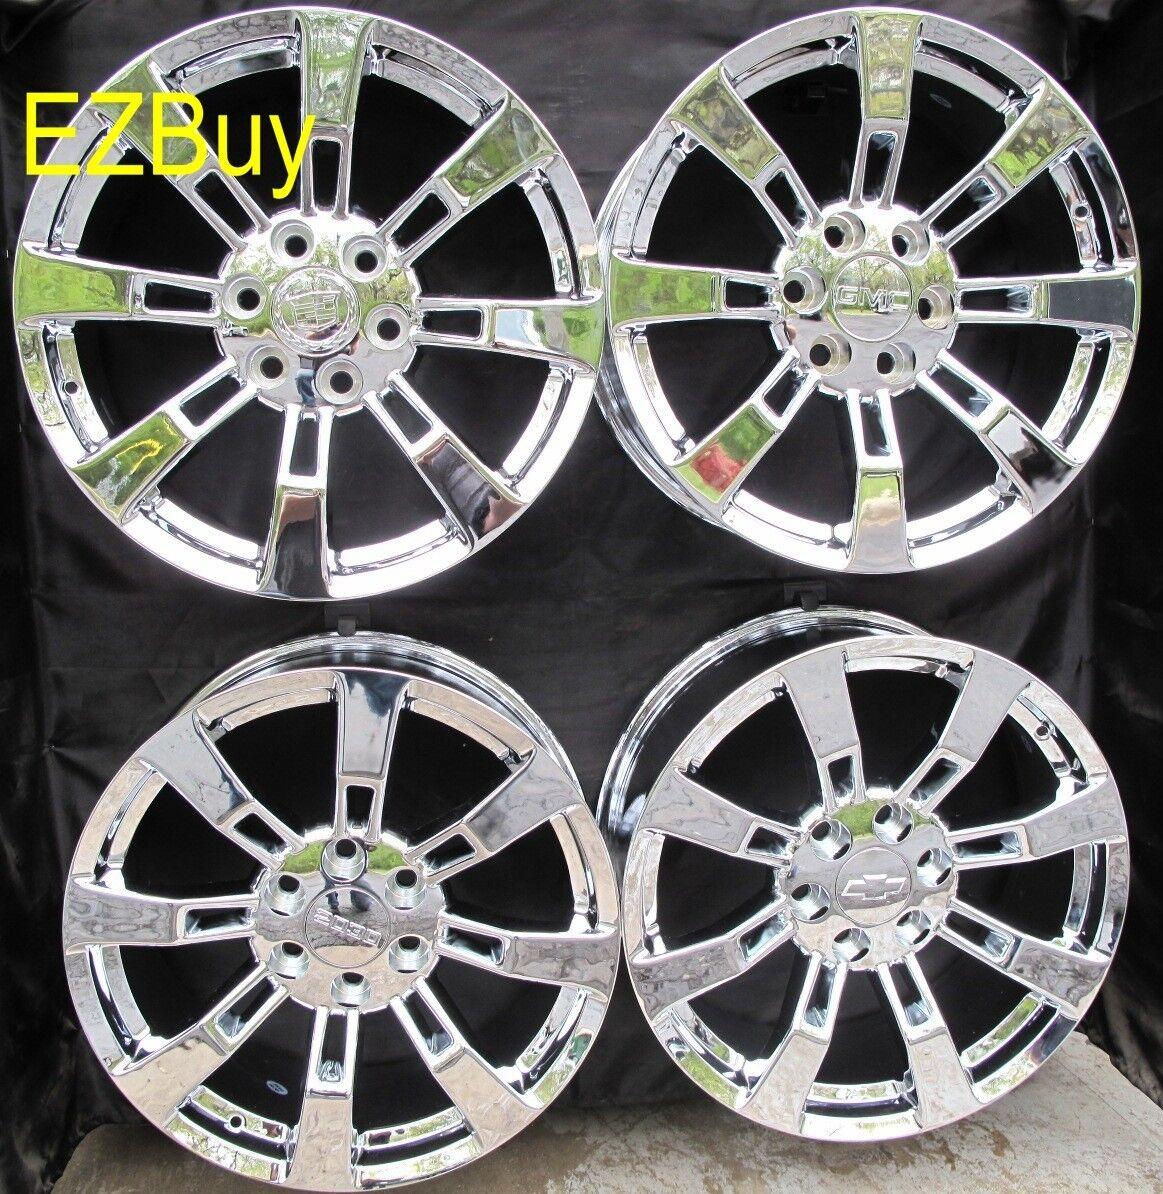 Escalade Factory Style New Chrome Wheels Rims Set of Four 5409